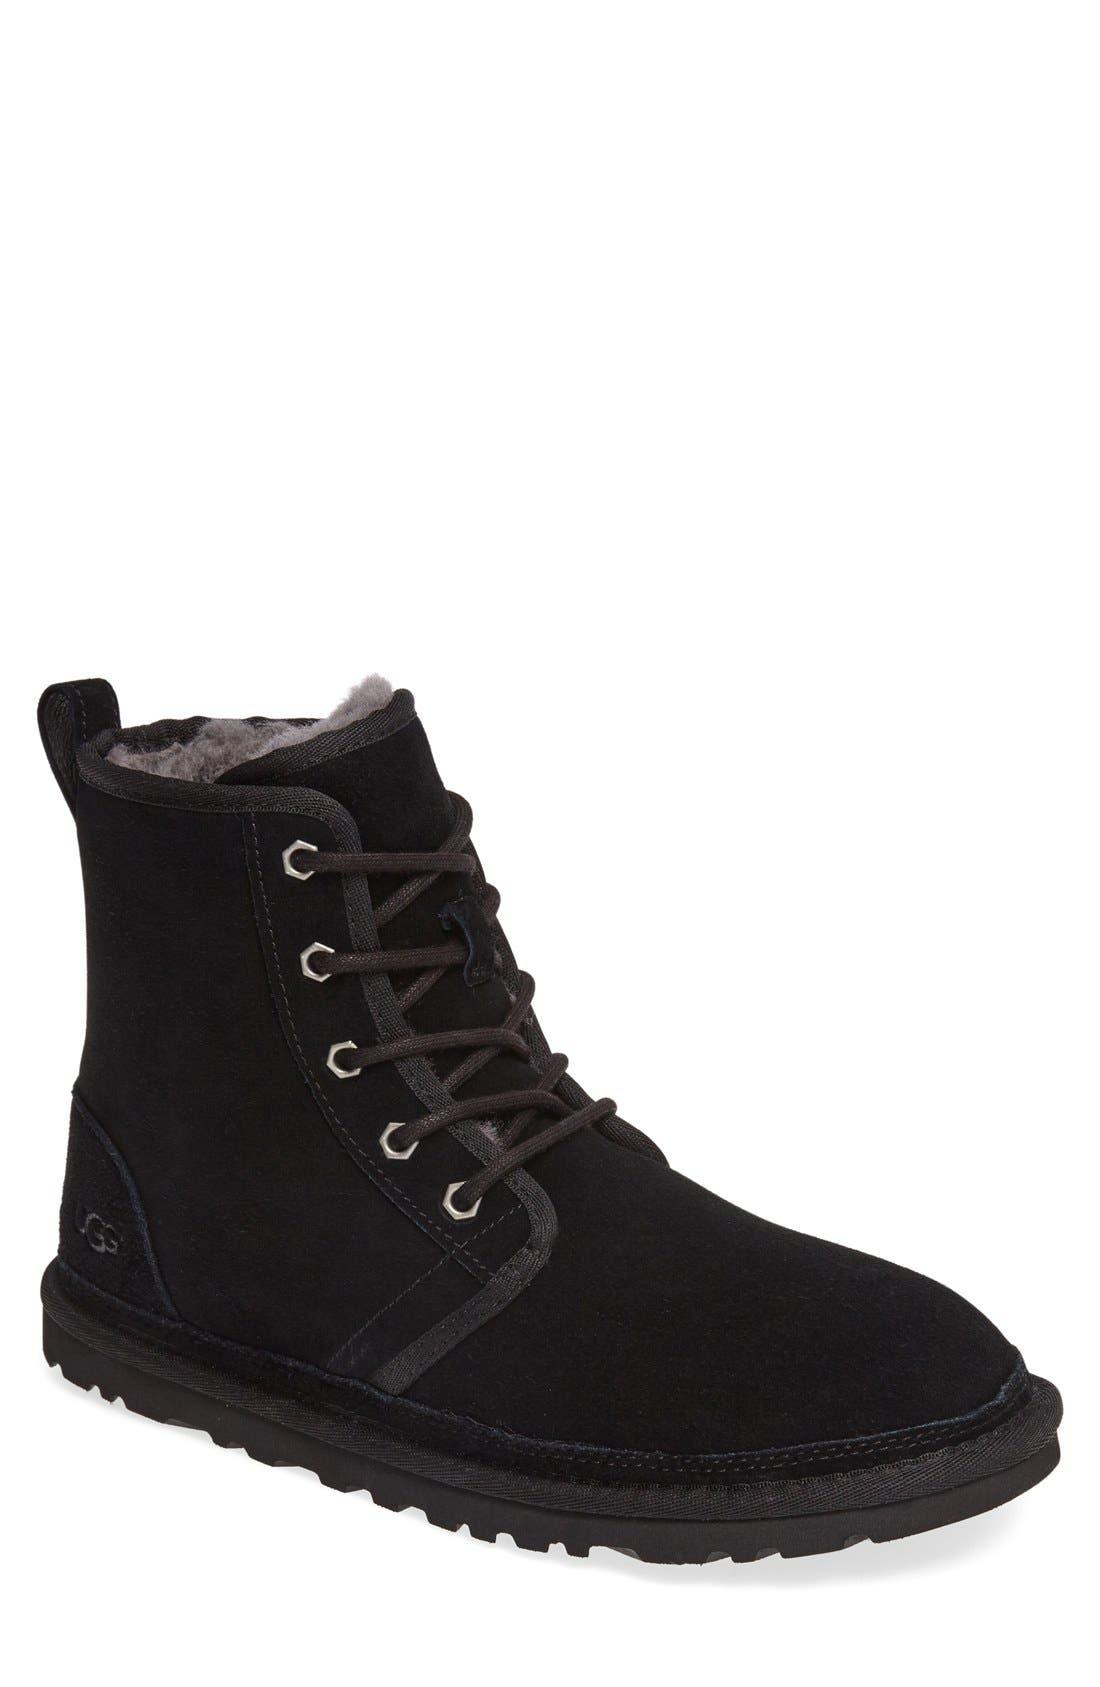 UGG<SUP>®</SUP>, Harkley Lace-Up Boot, Main thumbnail 1, color, BLACK